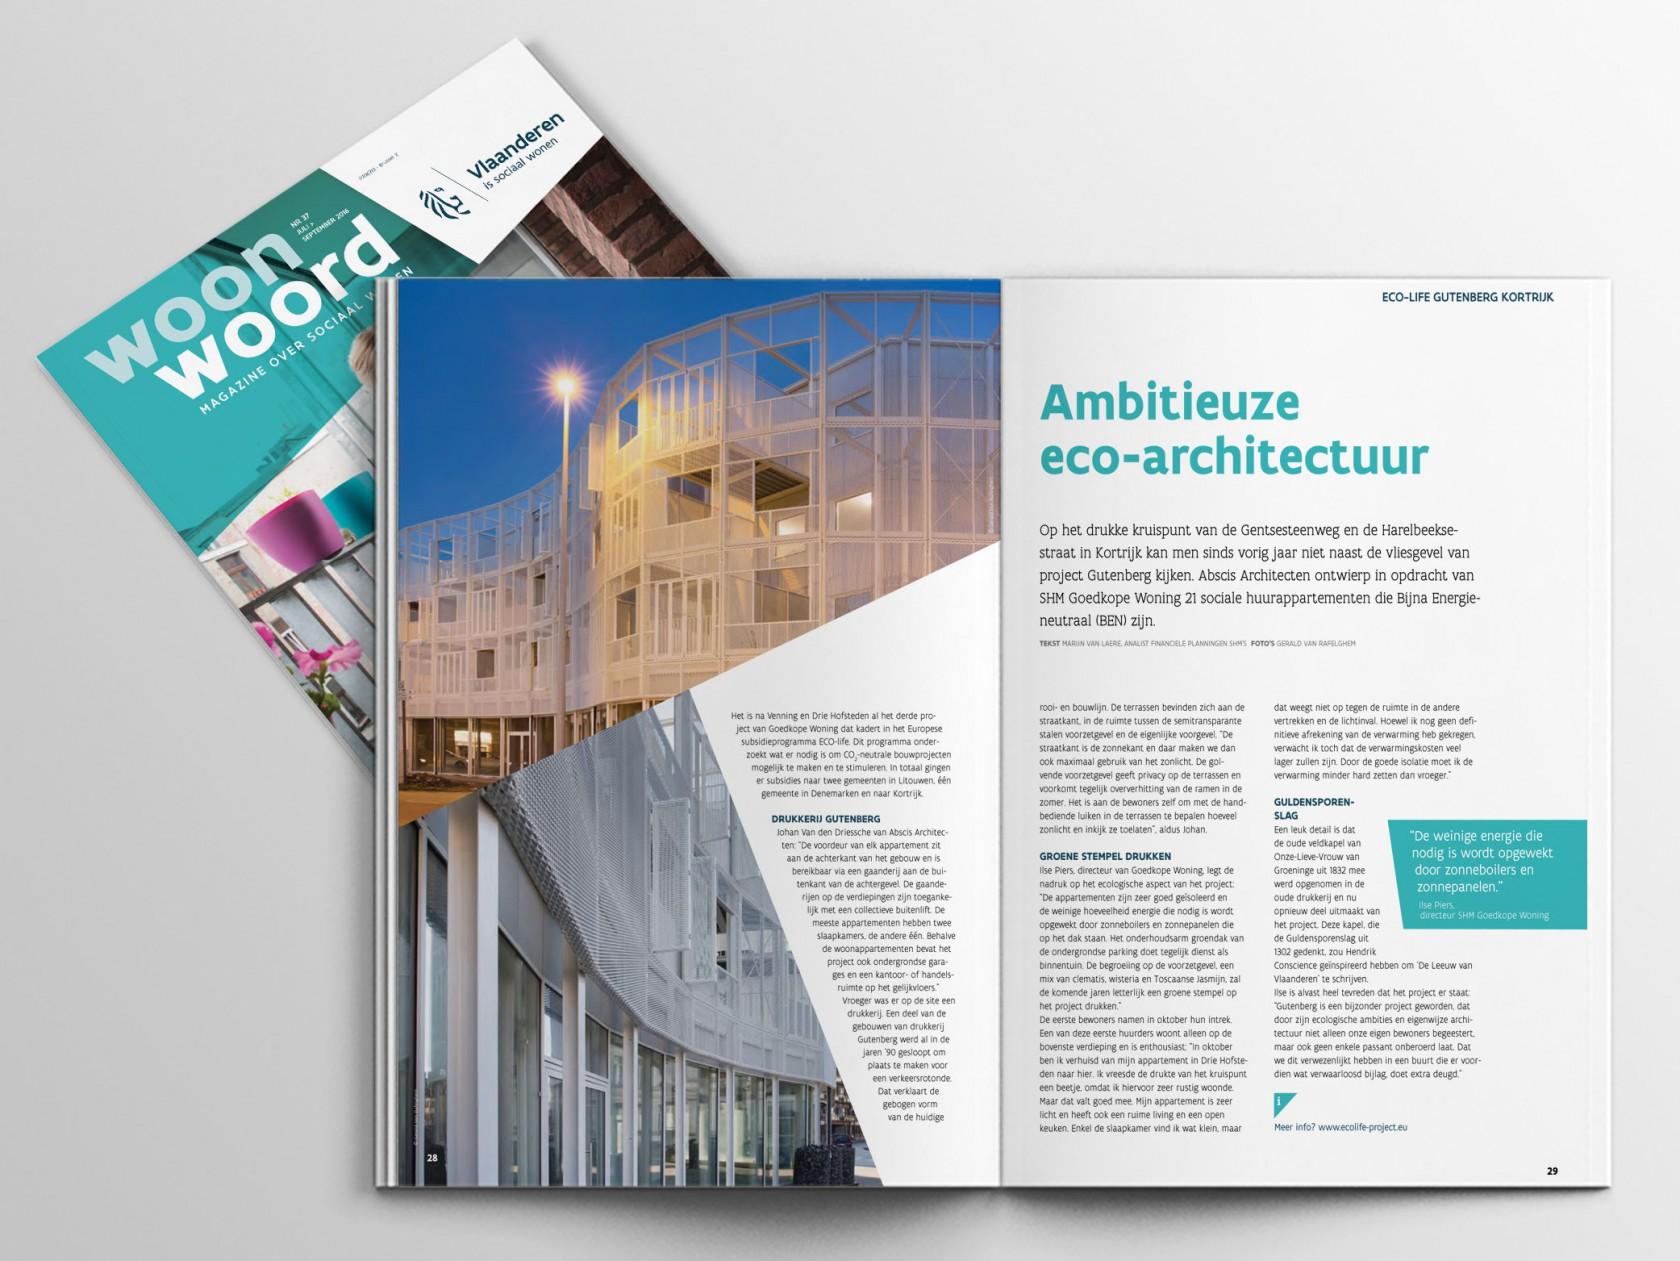 Abscis Architecten - Woonwoord - Ambitieuze eco-architectuur